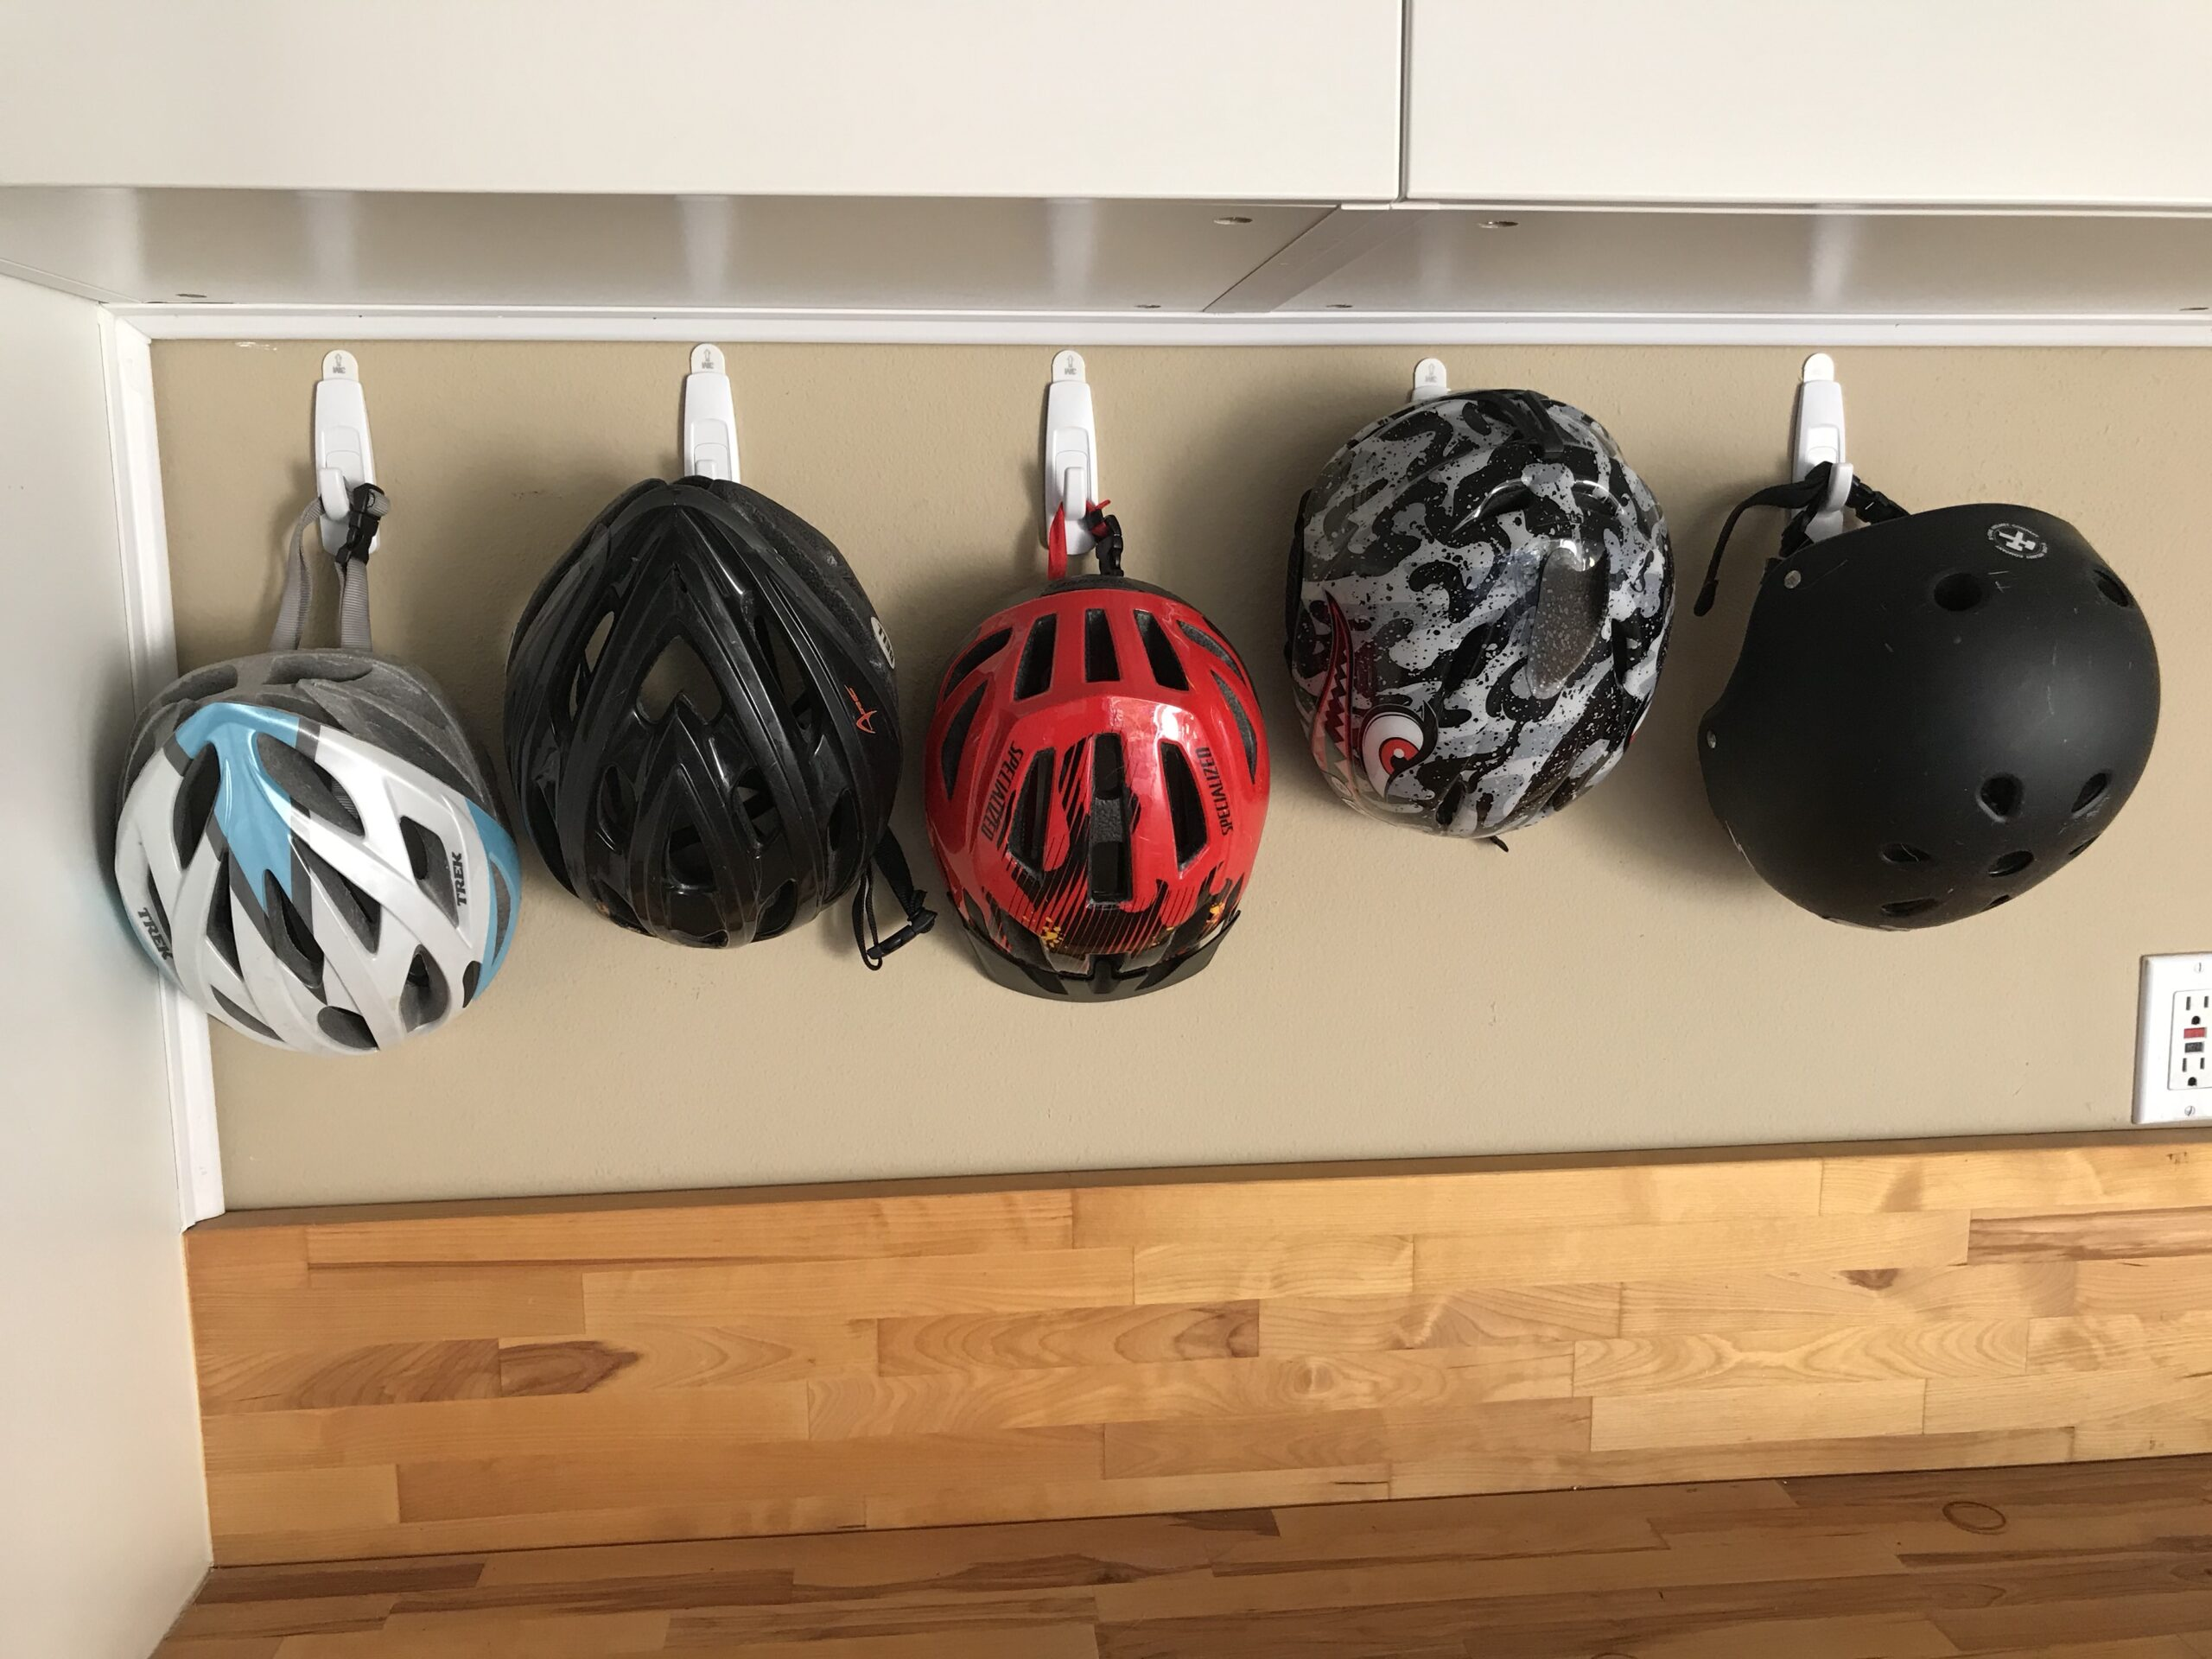 Bicycle Helmet Organizing